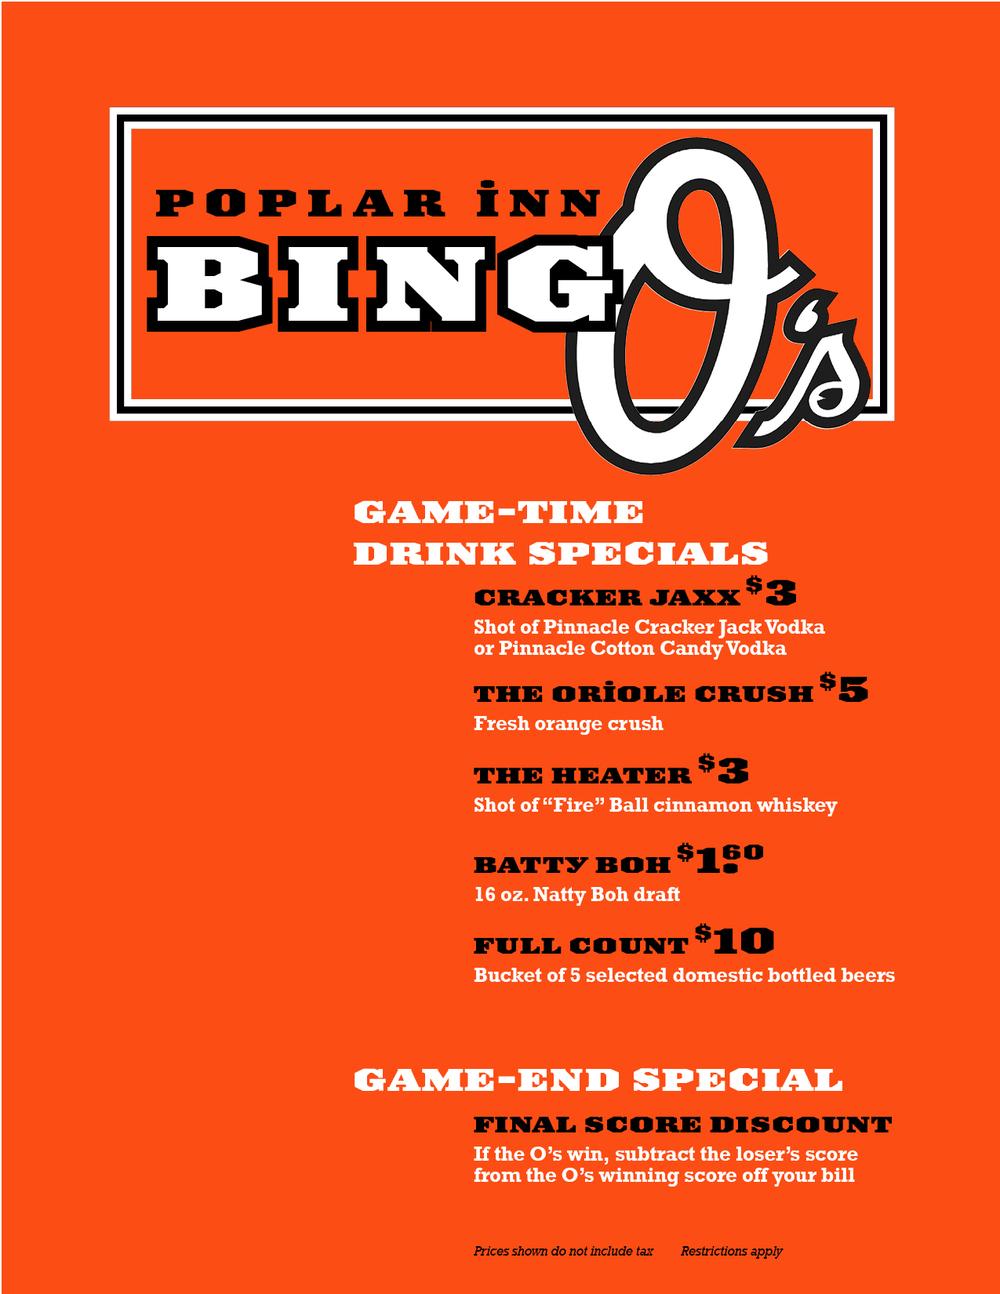 PI BingO's 0814143.jpg